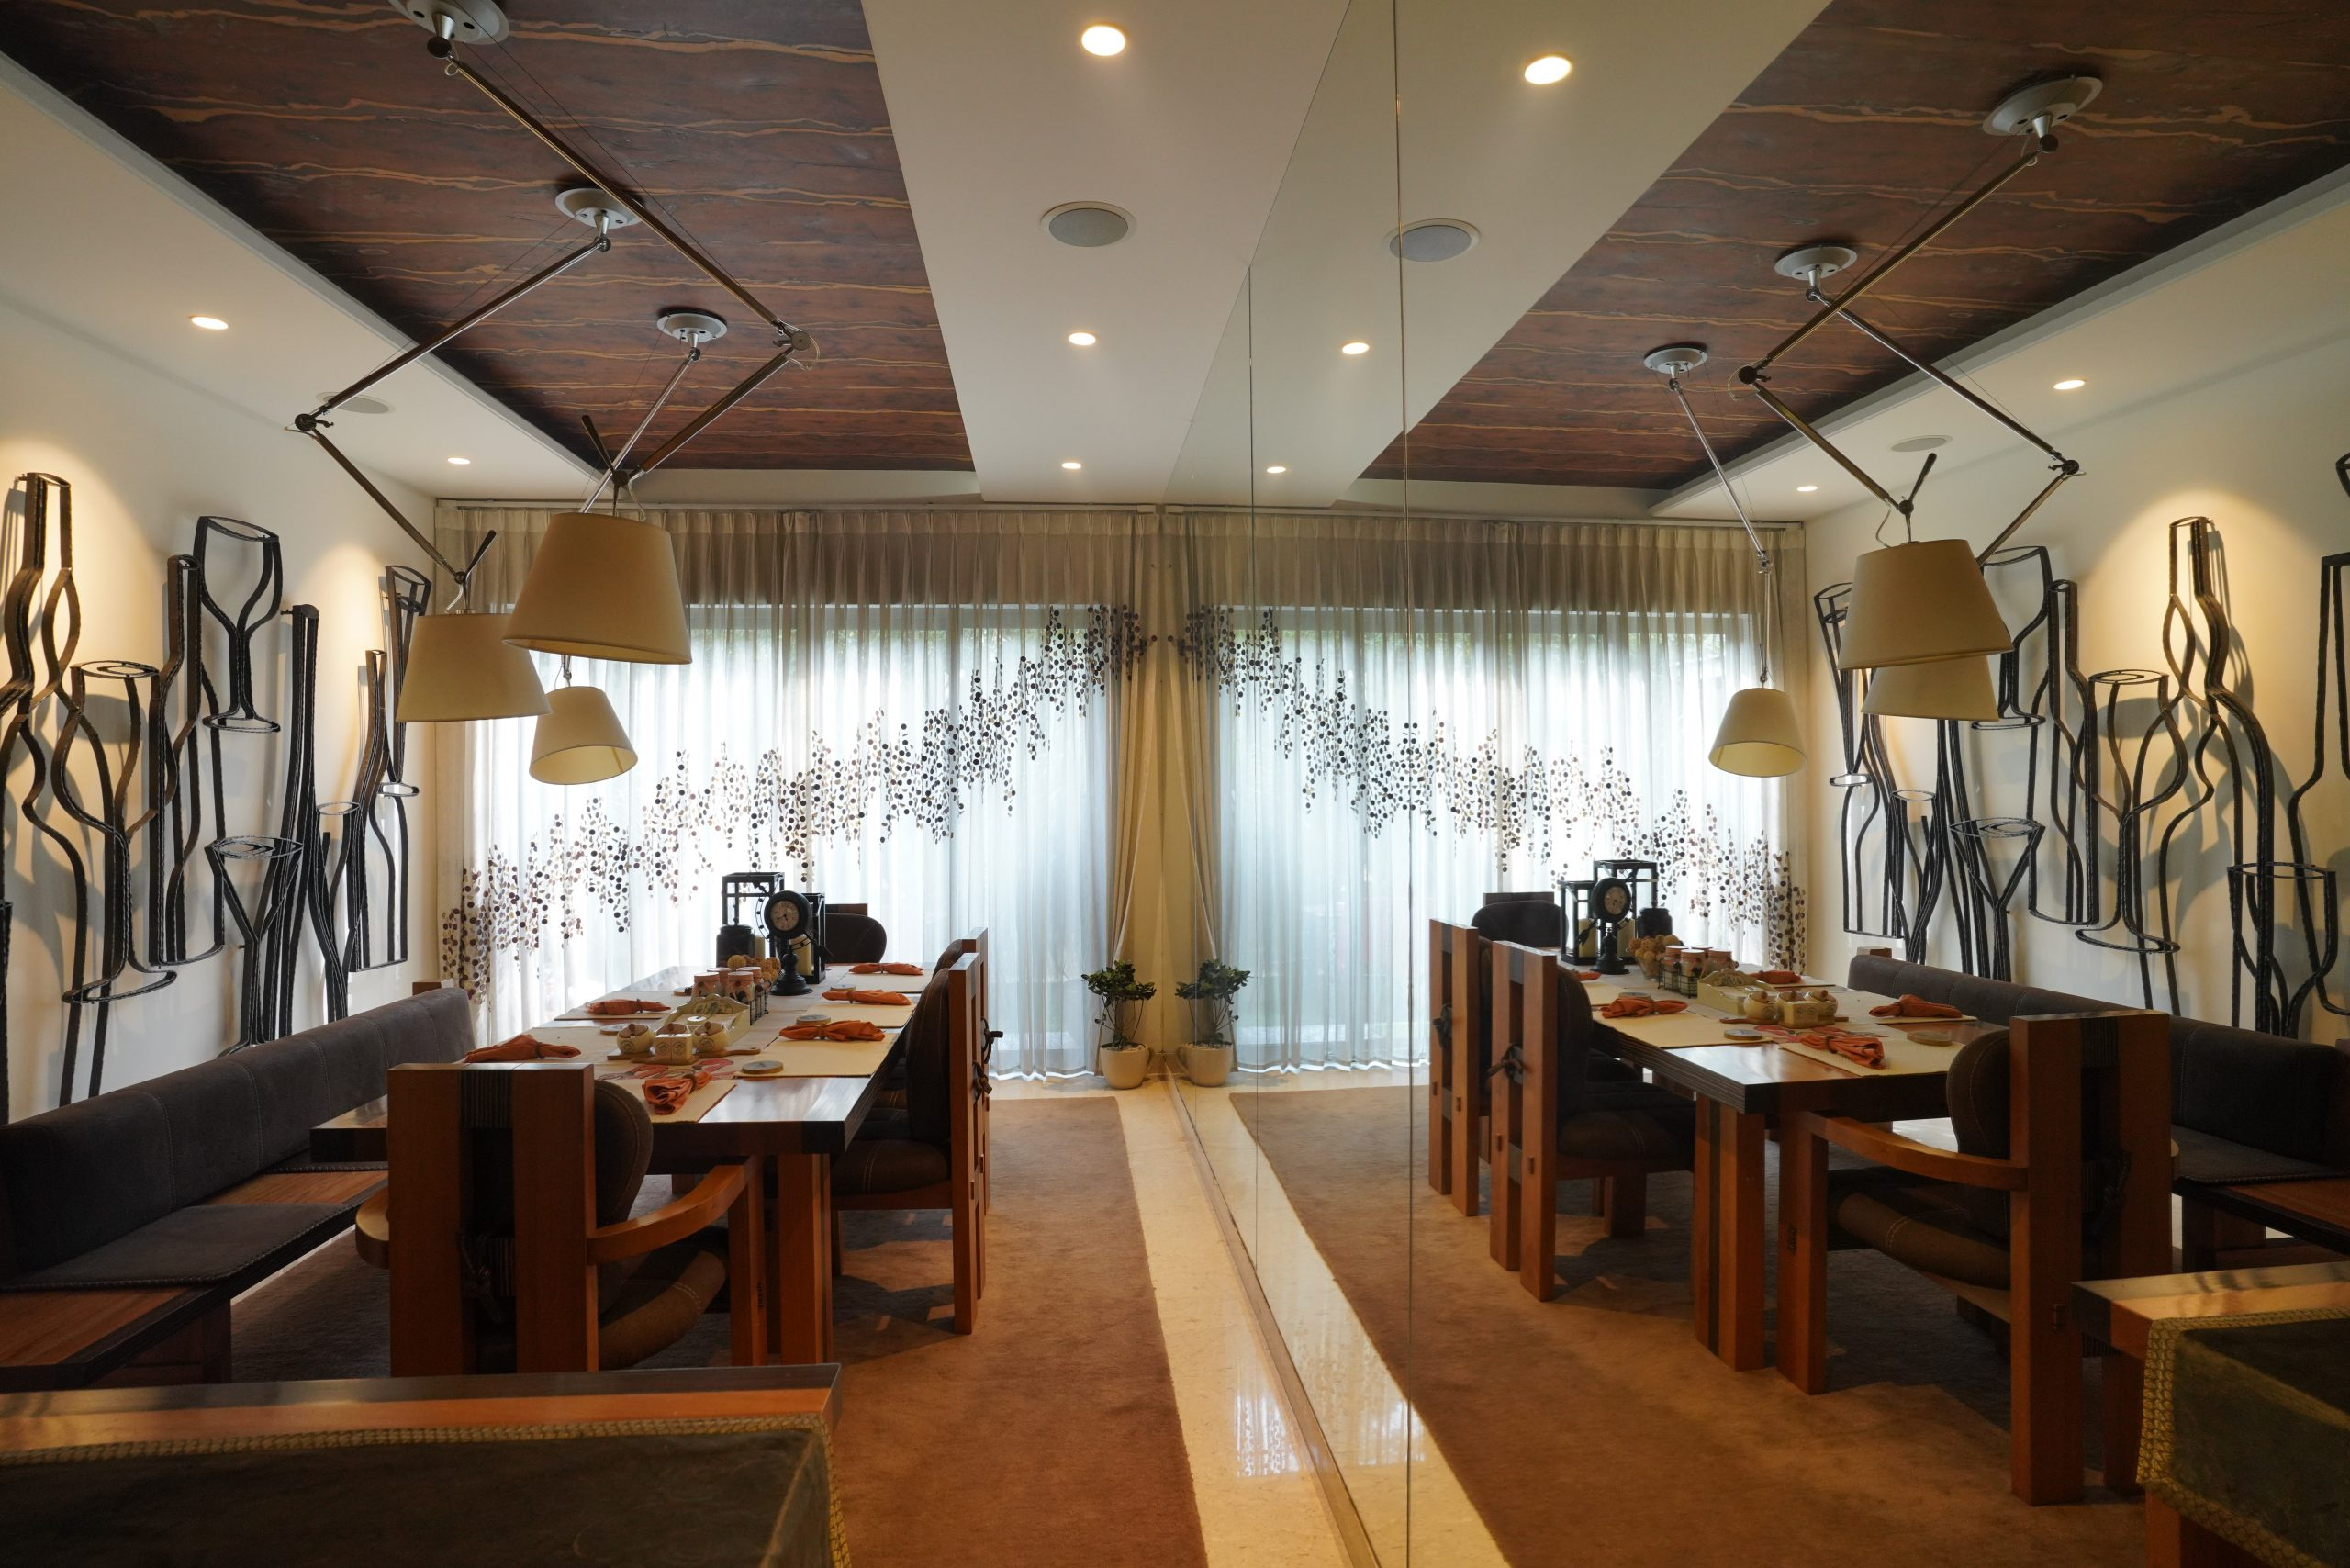 Interior decoration of a dining hall